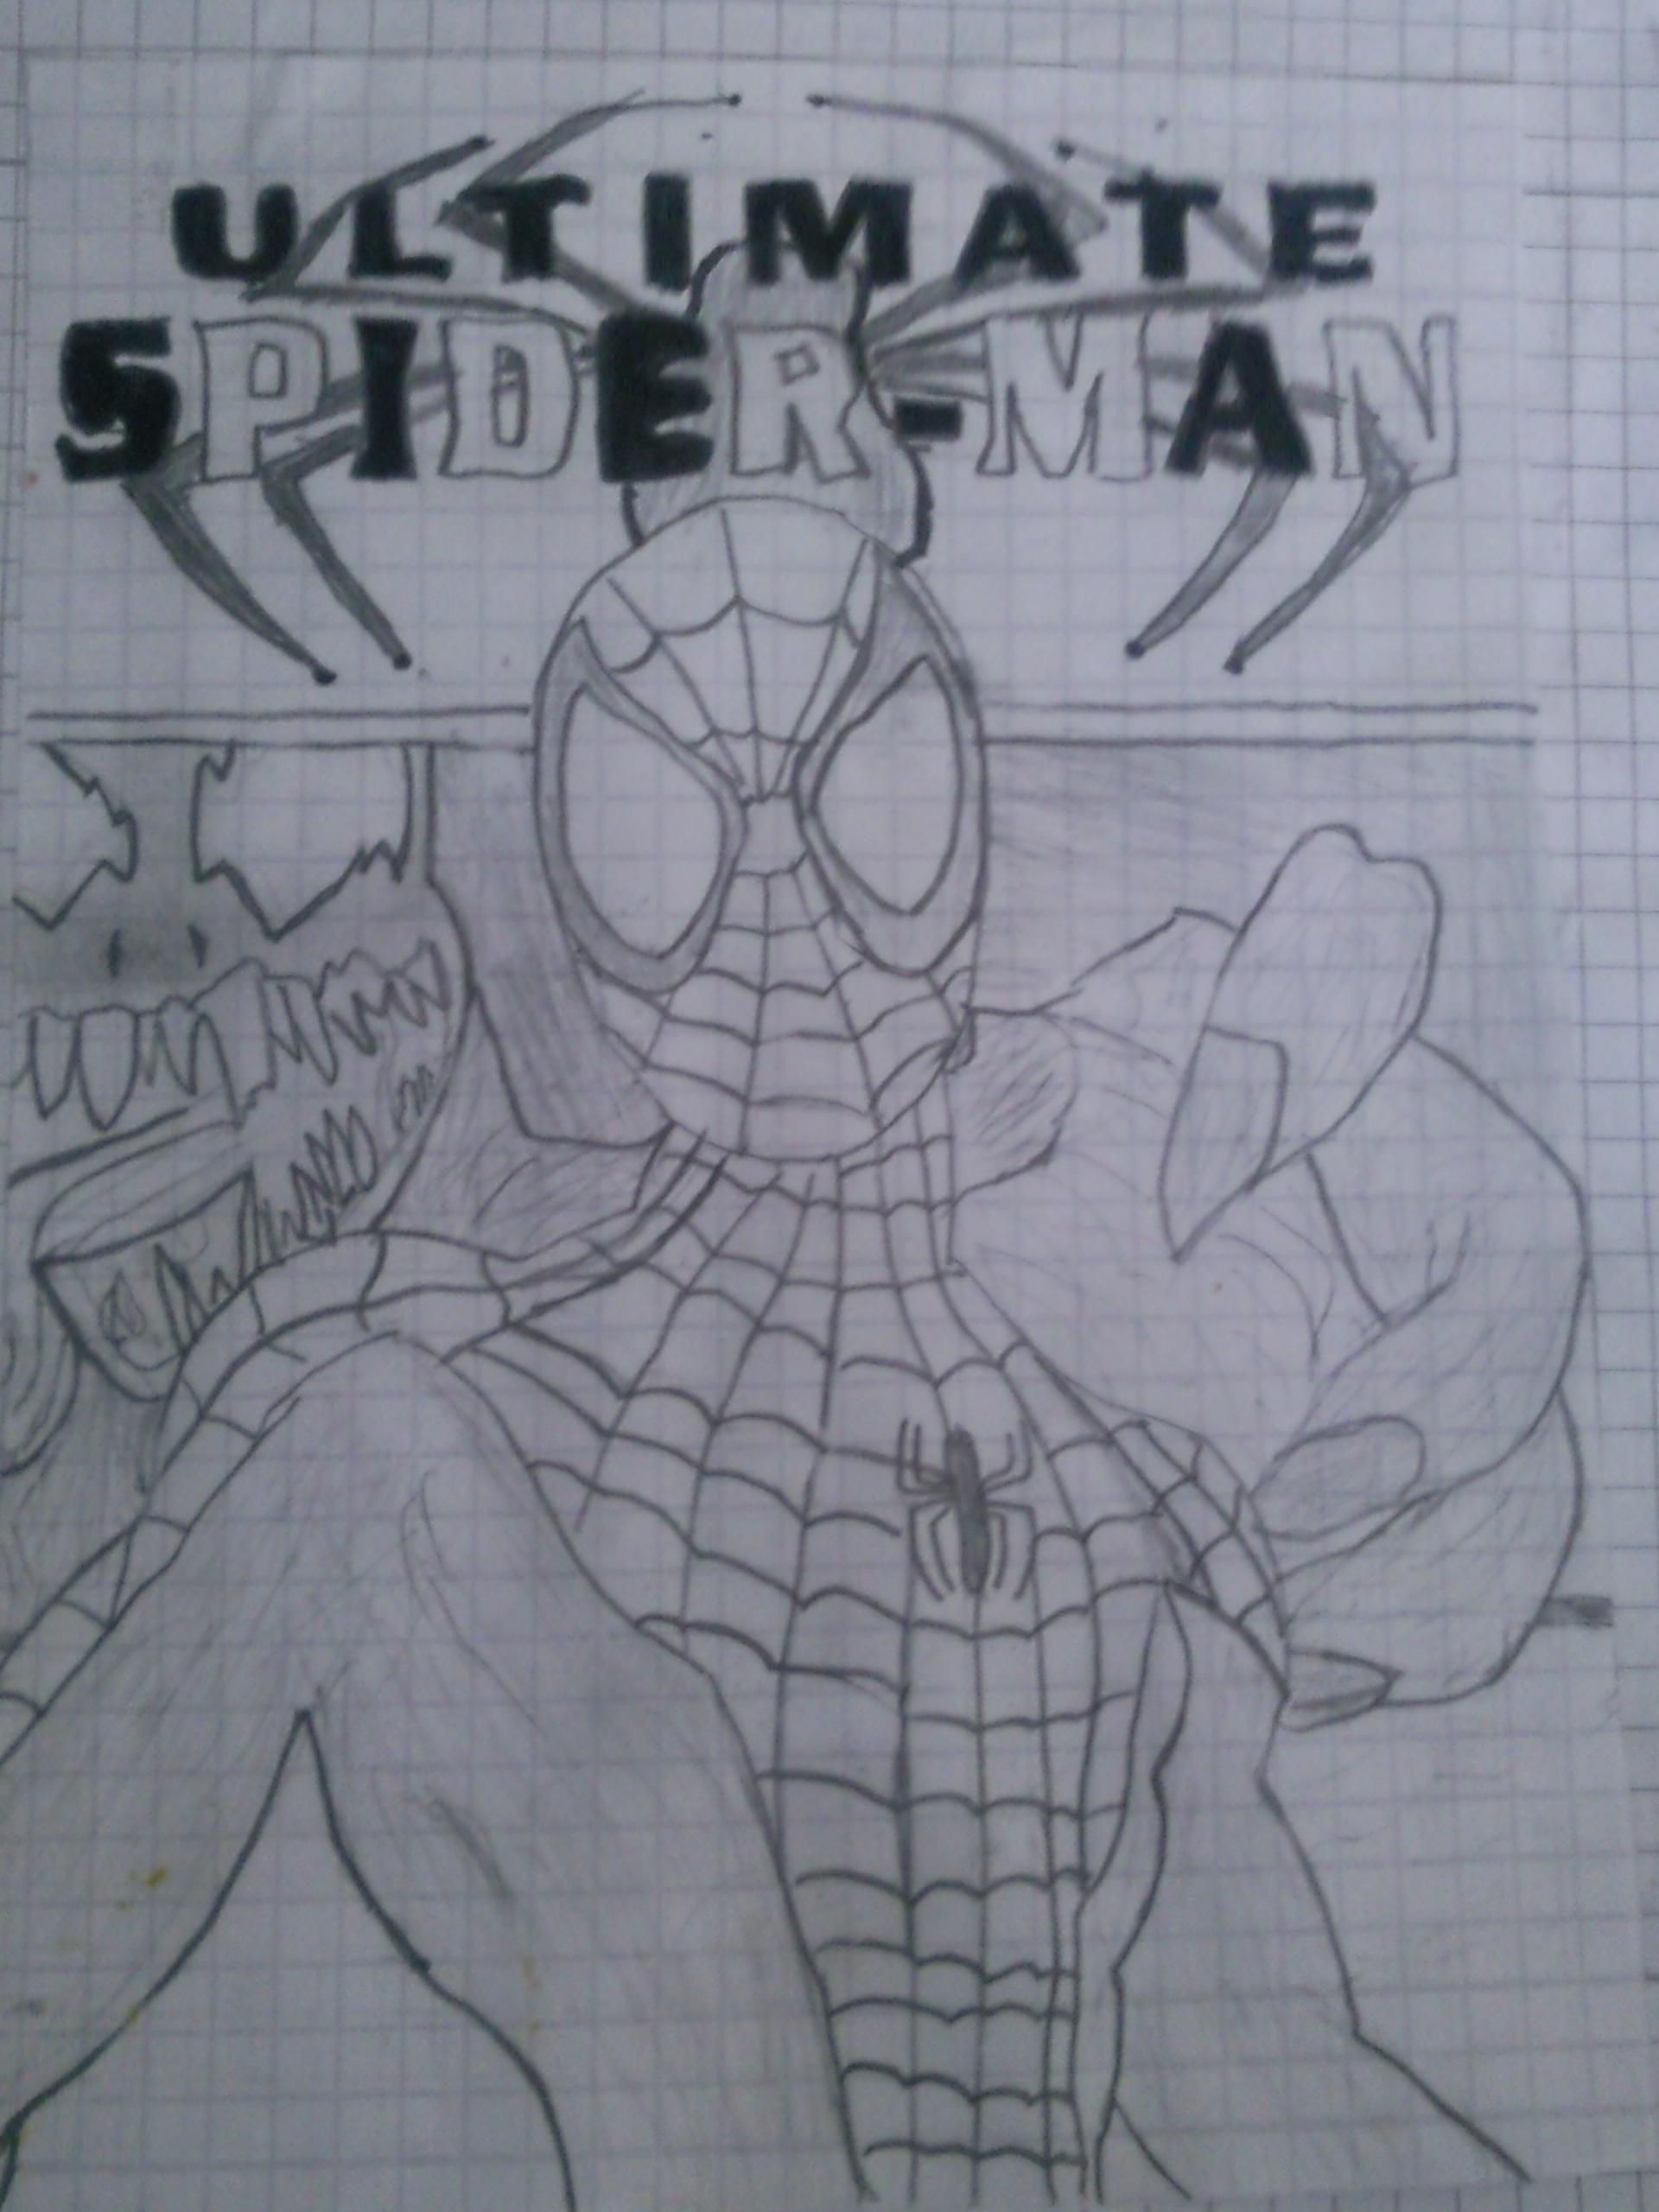 Spiderman - Ultimate Spider-Man